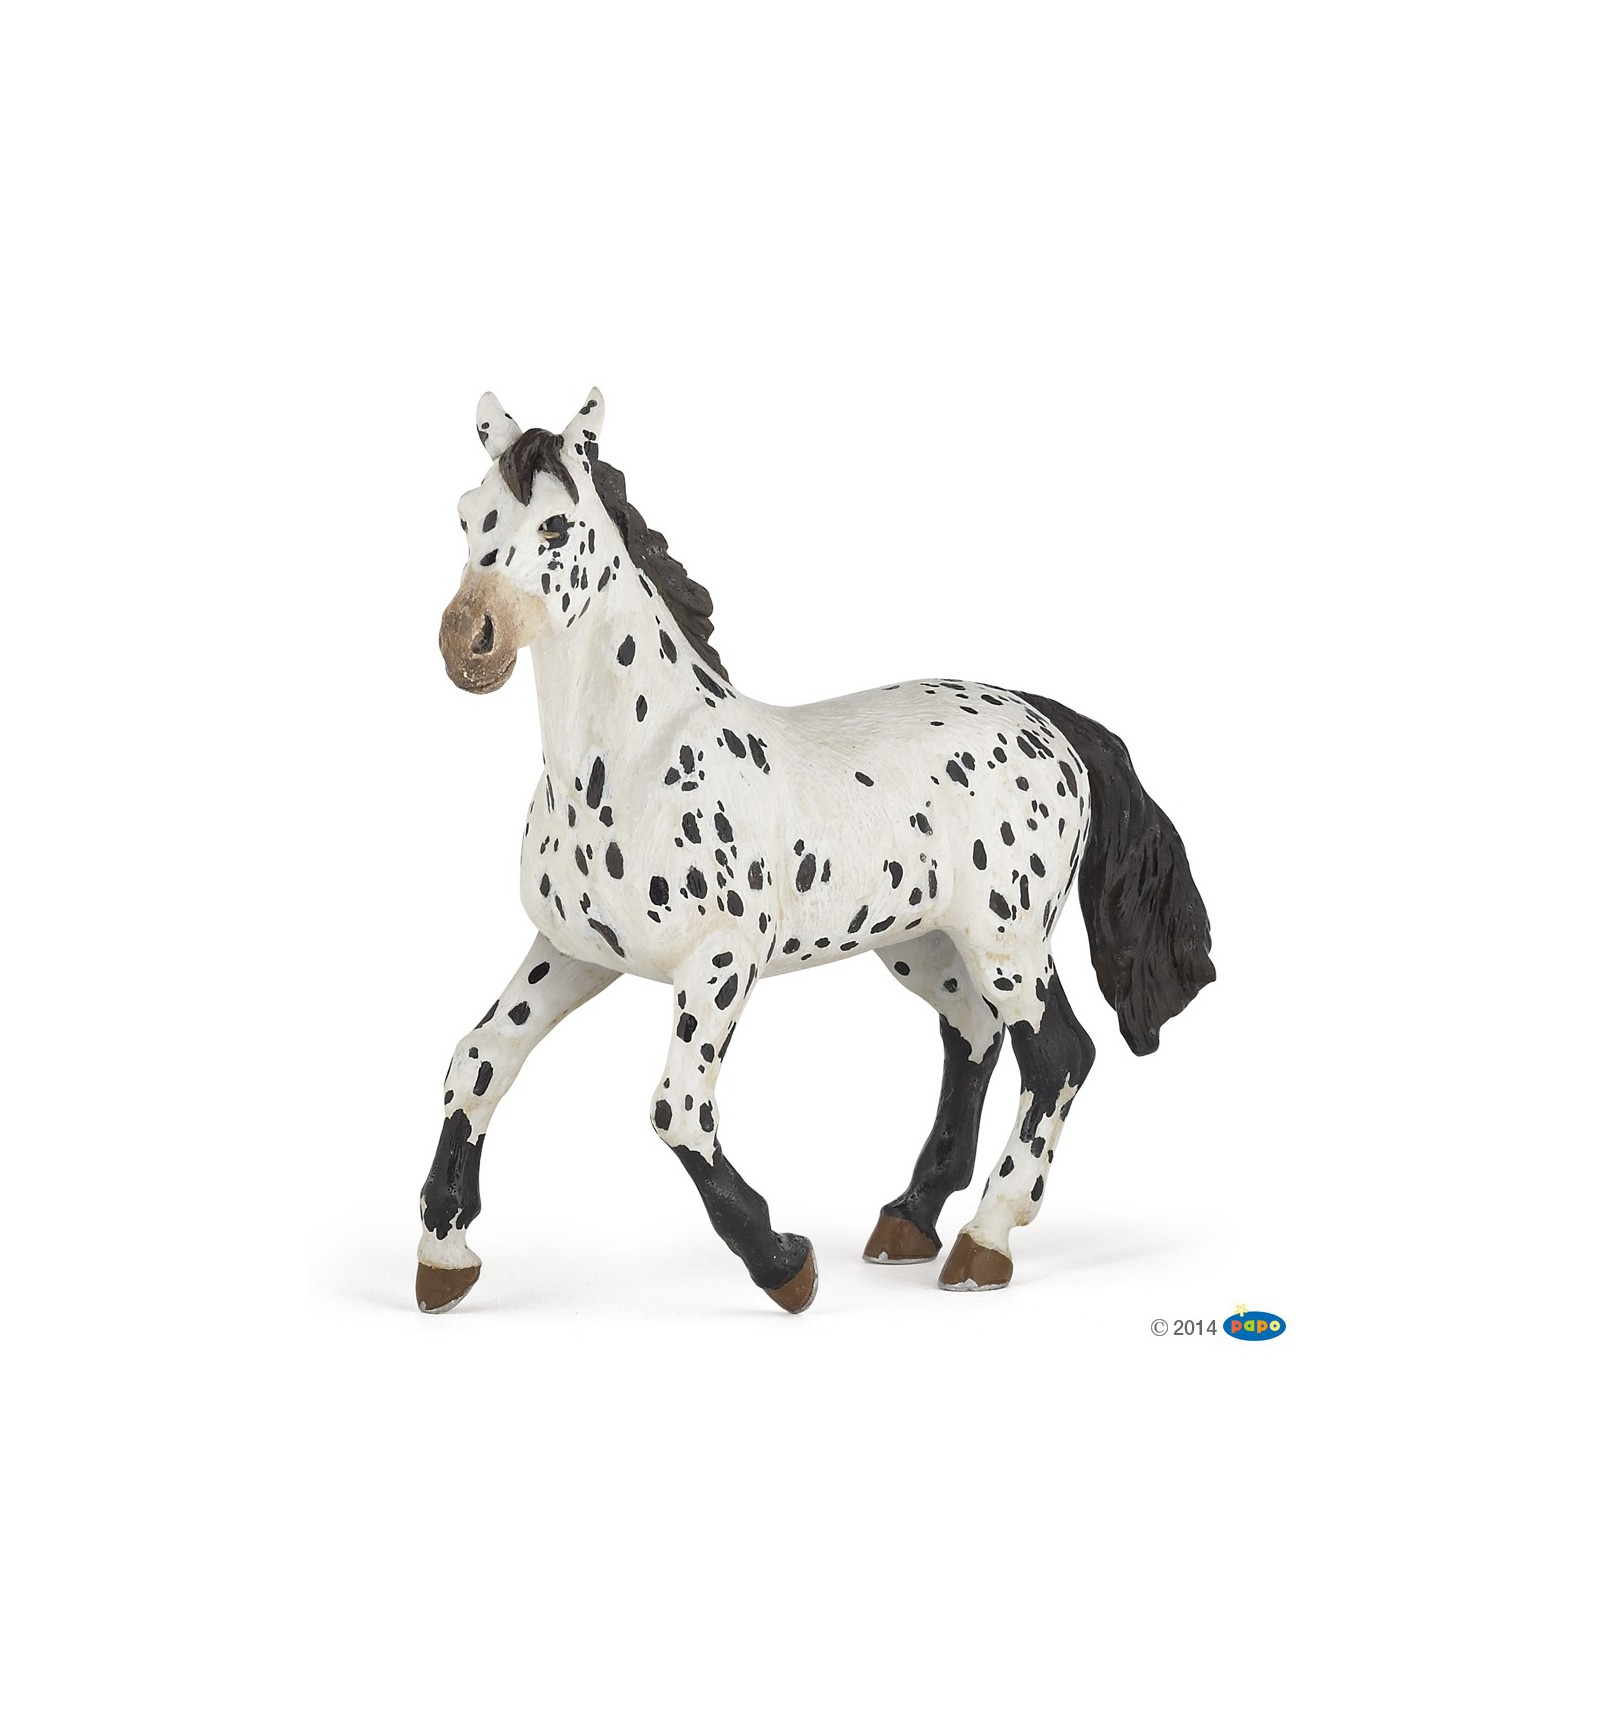 Black Appaloosa Horse Papo